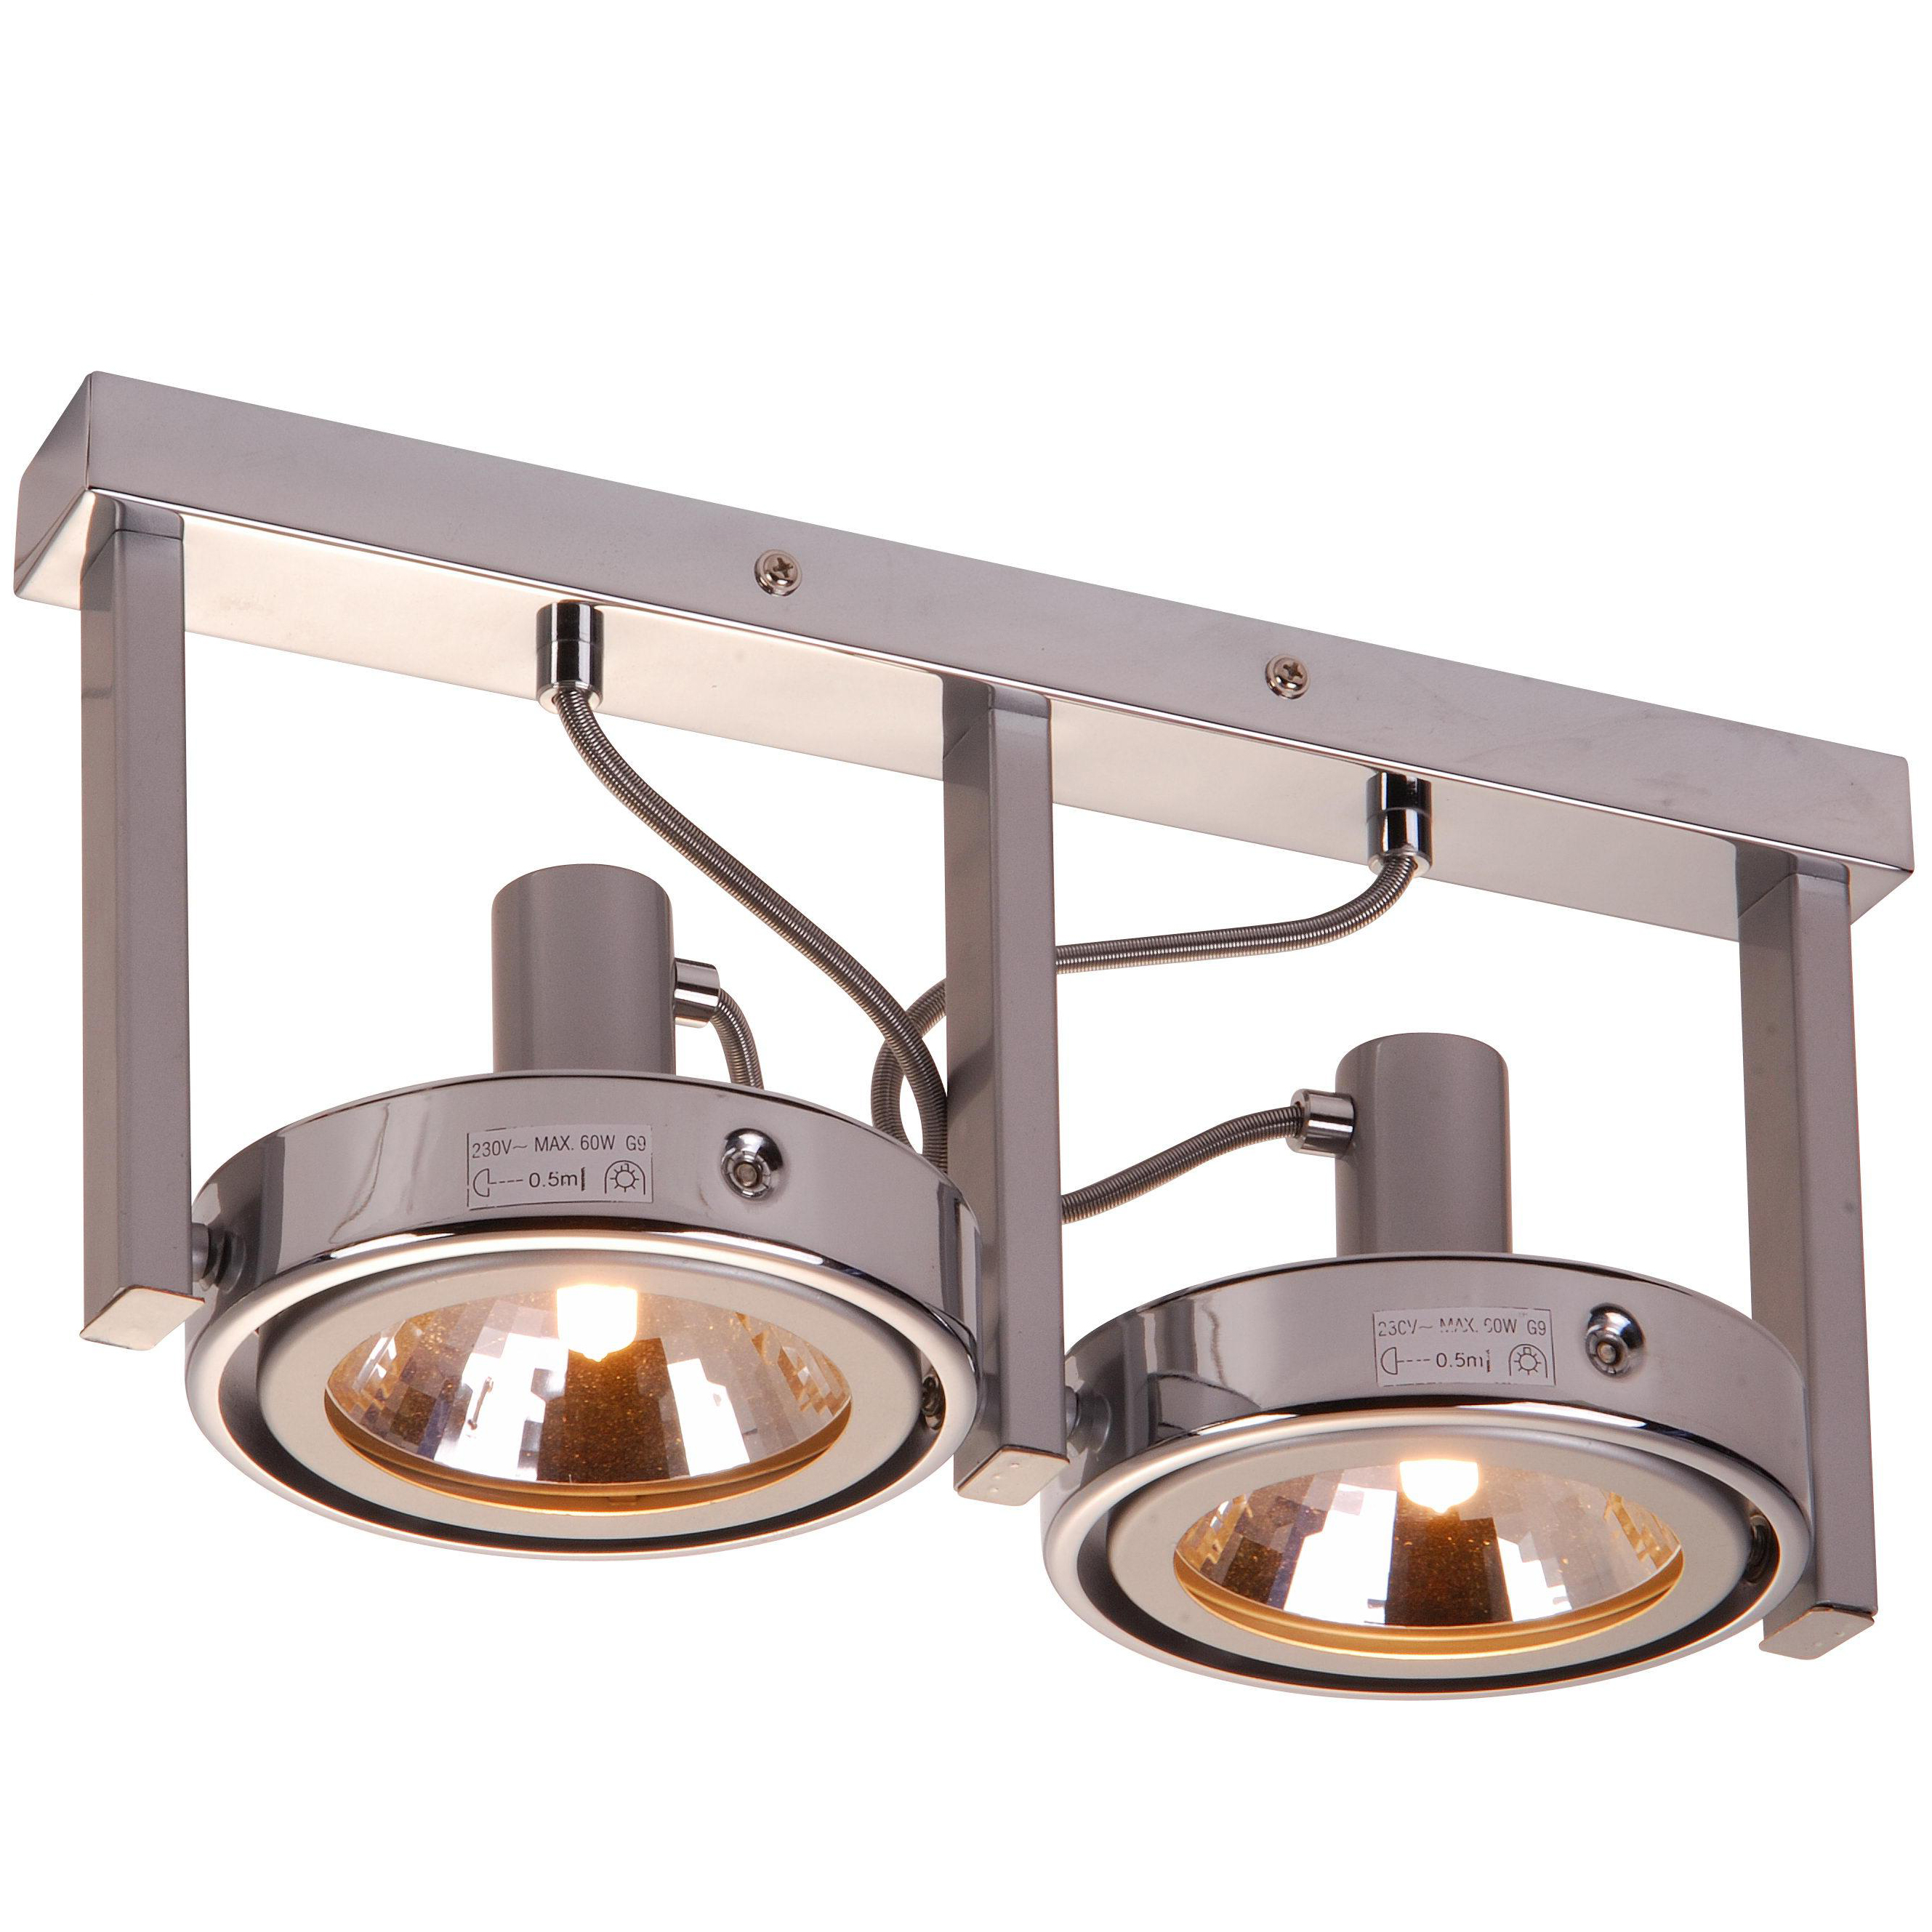 Спот GloboСпоты<br>Тип: спот,<br>Стиль светильника: модерн,<br>Материал светильника: металл,<br>Количество ламп: 2,<br>Тип лампы: галогенная,<br>Мощность: 52,<br>Патрон: G9,<br>Цвет арматуры: серебристый,<br>Диаметр: 135,<br>Длина (мм): 360,<br>Высота: 170,<br>Коллекция: kuriana<br>